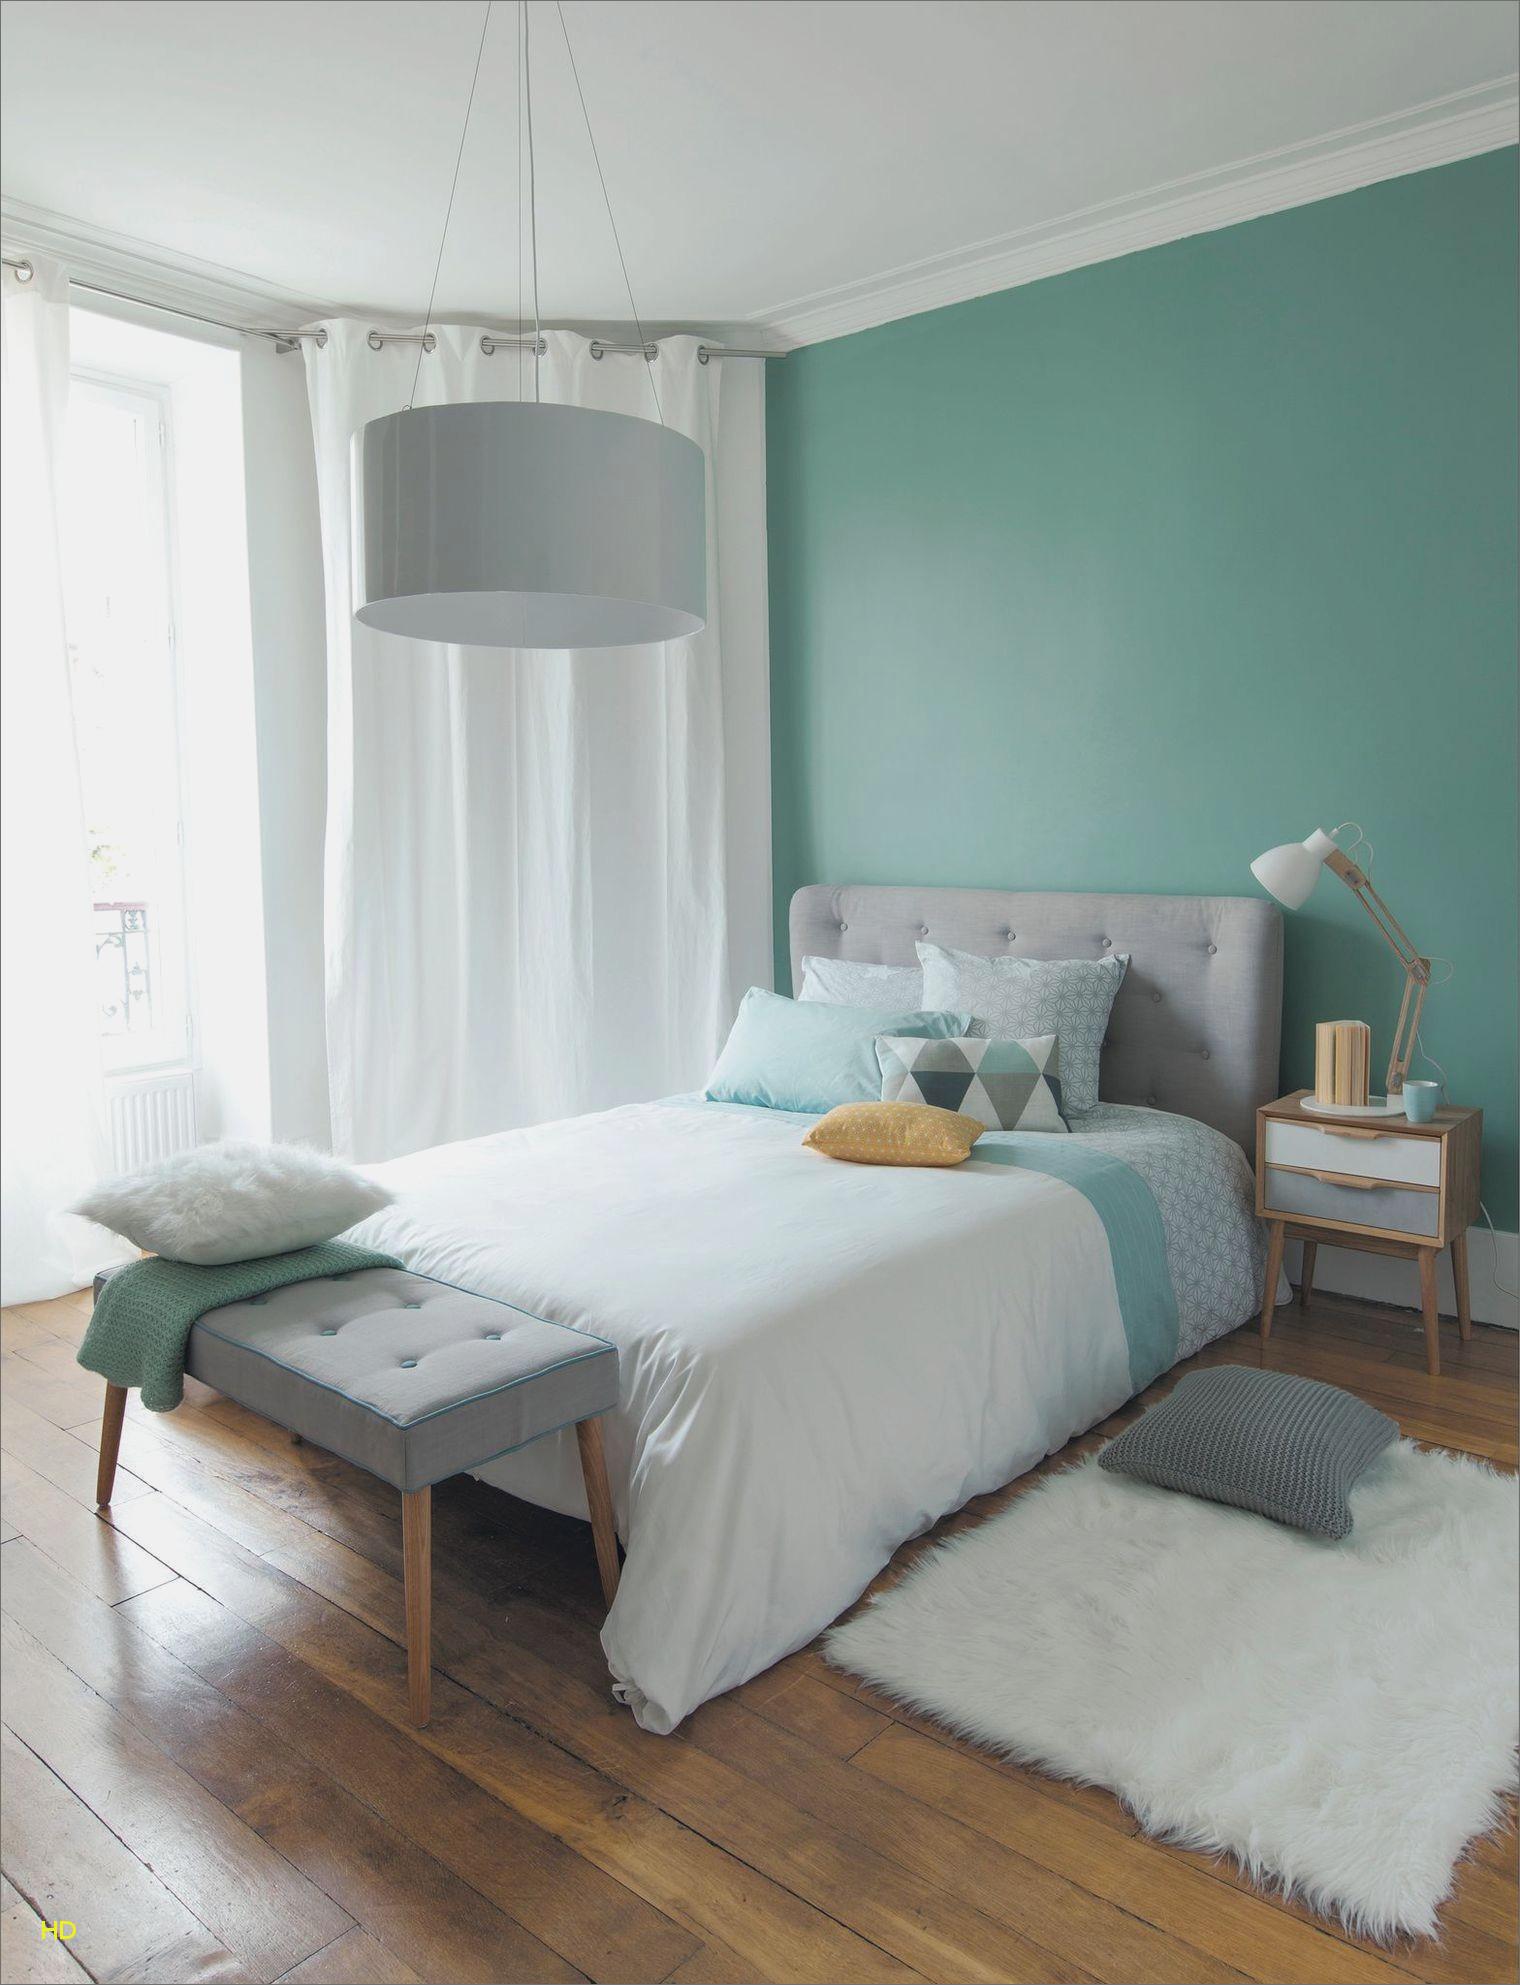 Idee Decoration Chambre Adulte - onestopcolorado.com -